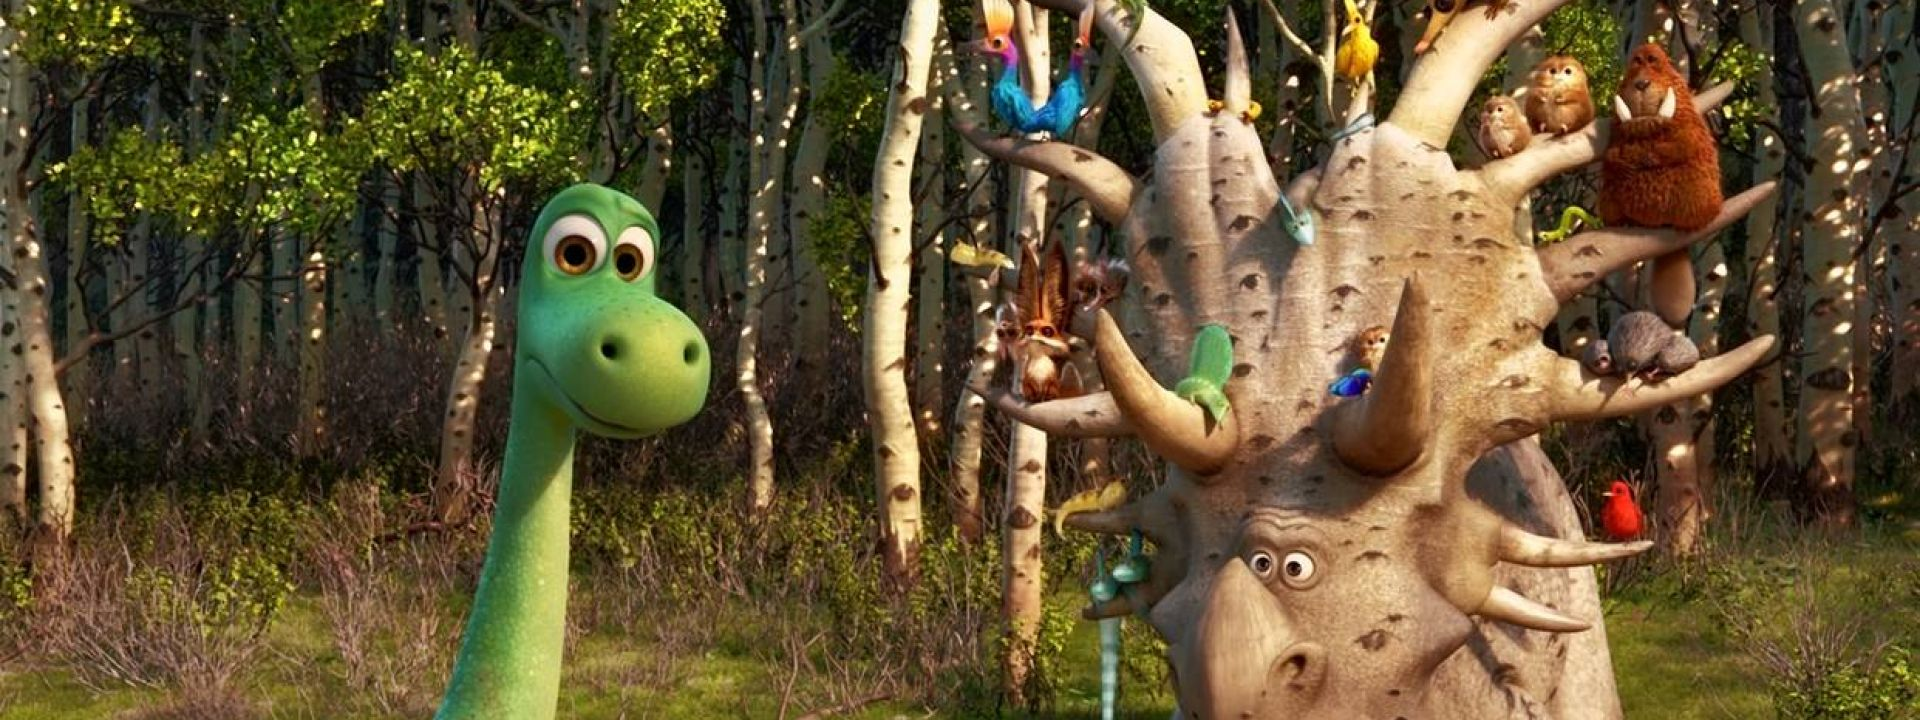 Park Your Cinema Kids: The Good Dinosaur (2015) - Εικόνα